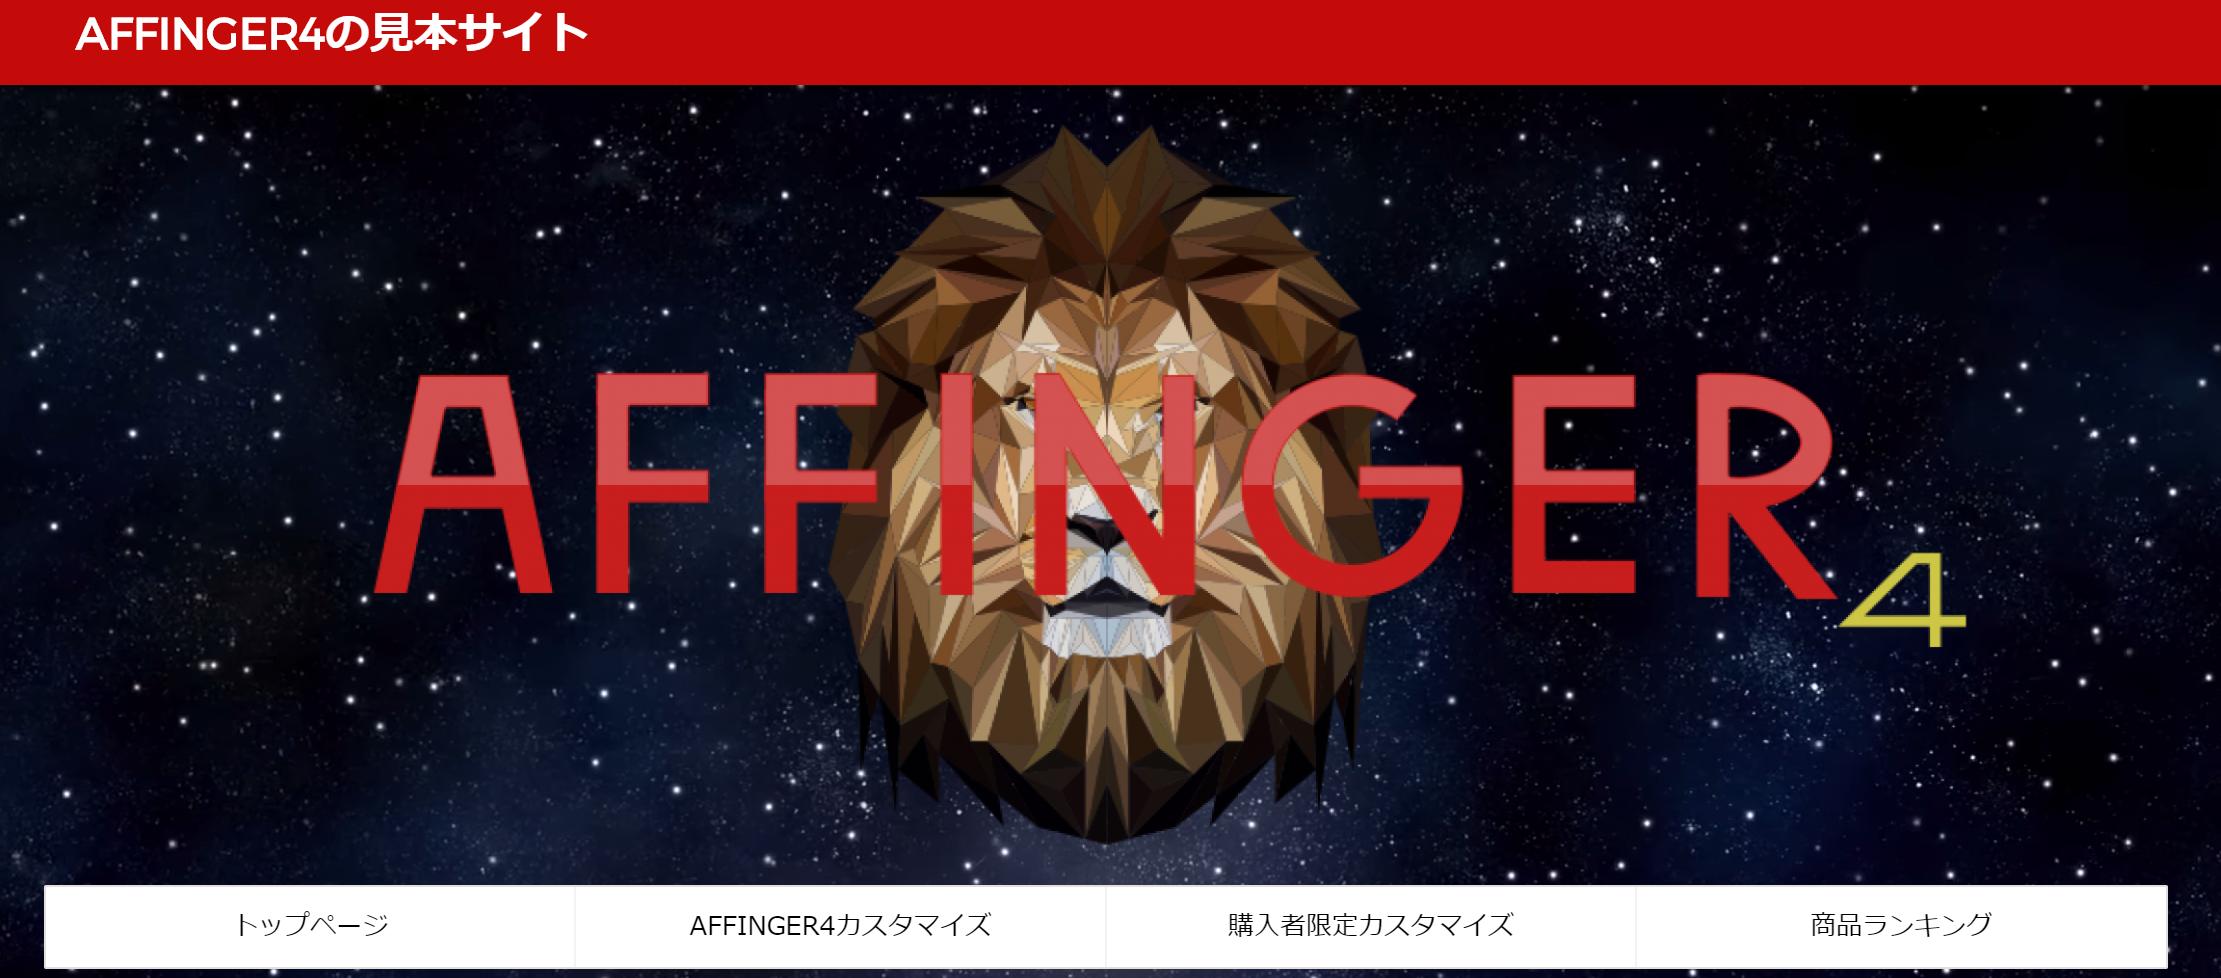 affinger - WordPressの有料テーマを使うメリットと初心者におすすめ15選を紹介